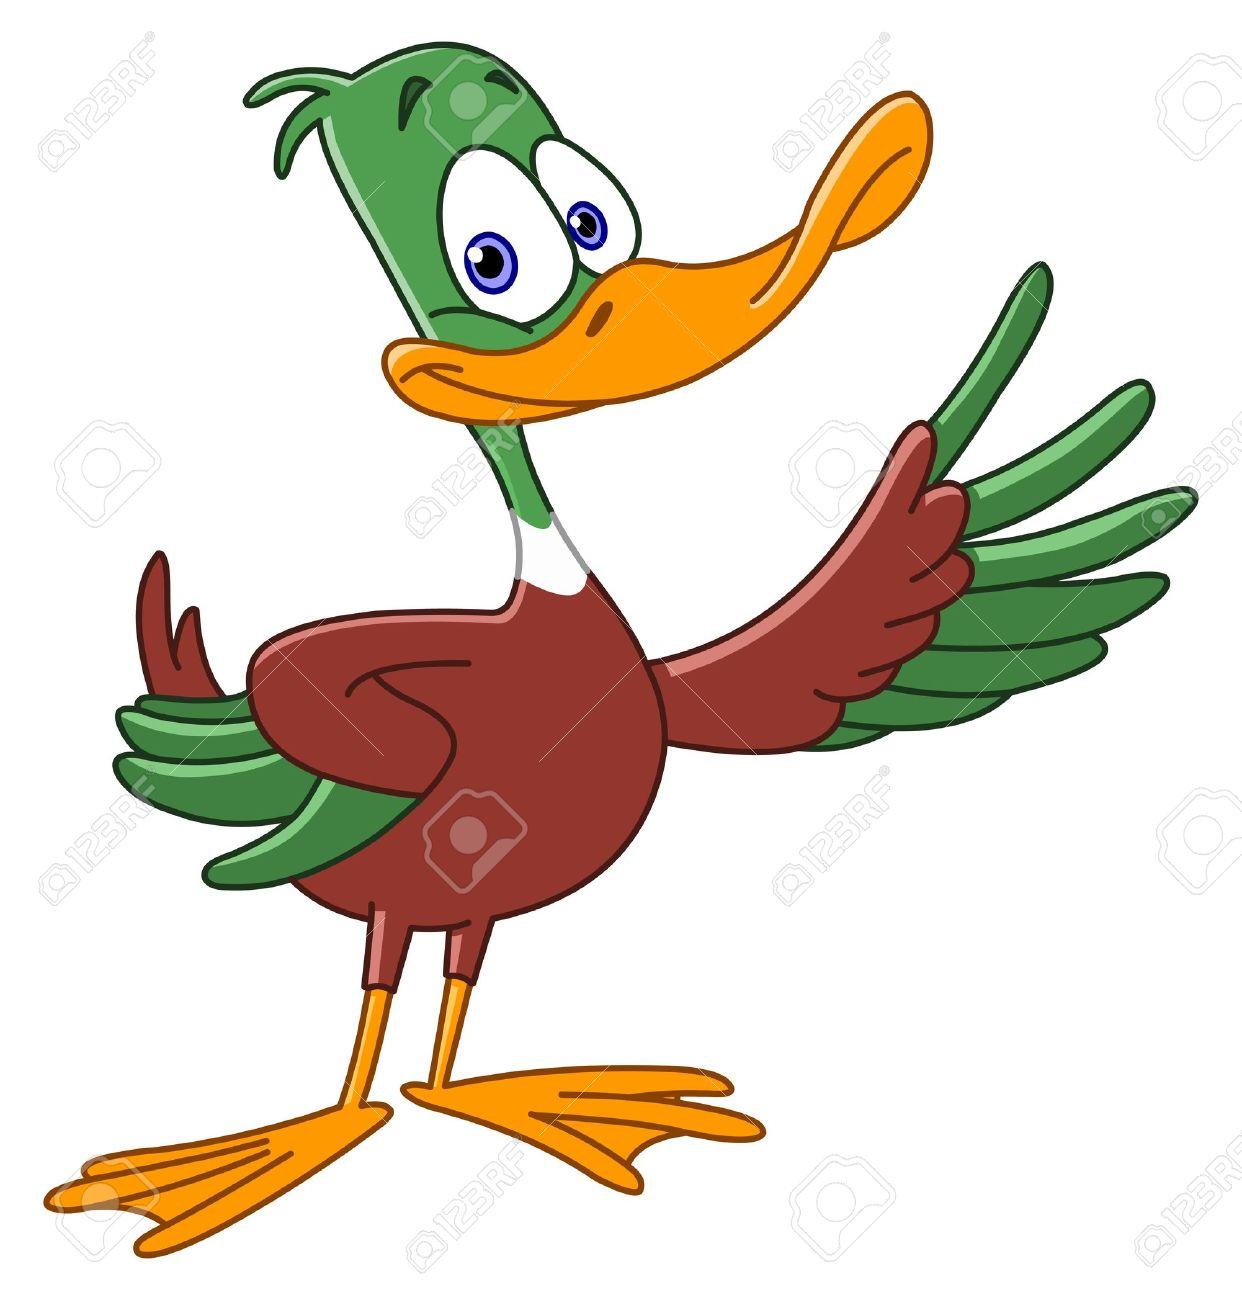 cartoon duck images u0026 stock pictures royalty free cartoon duck